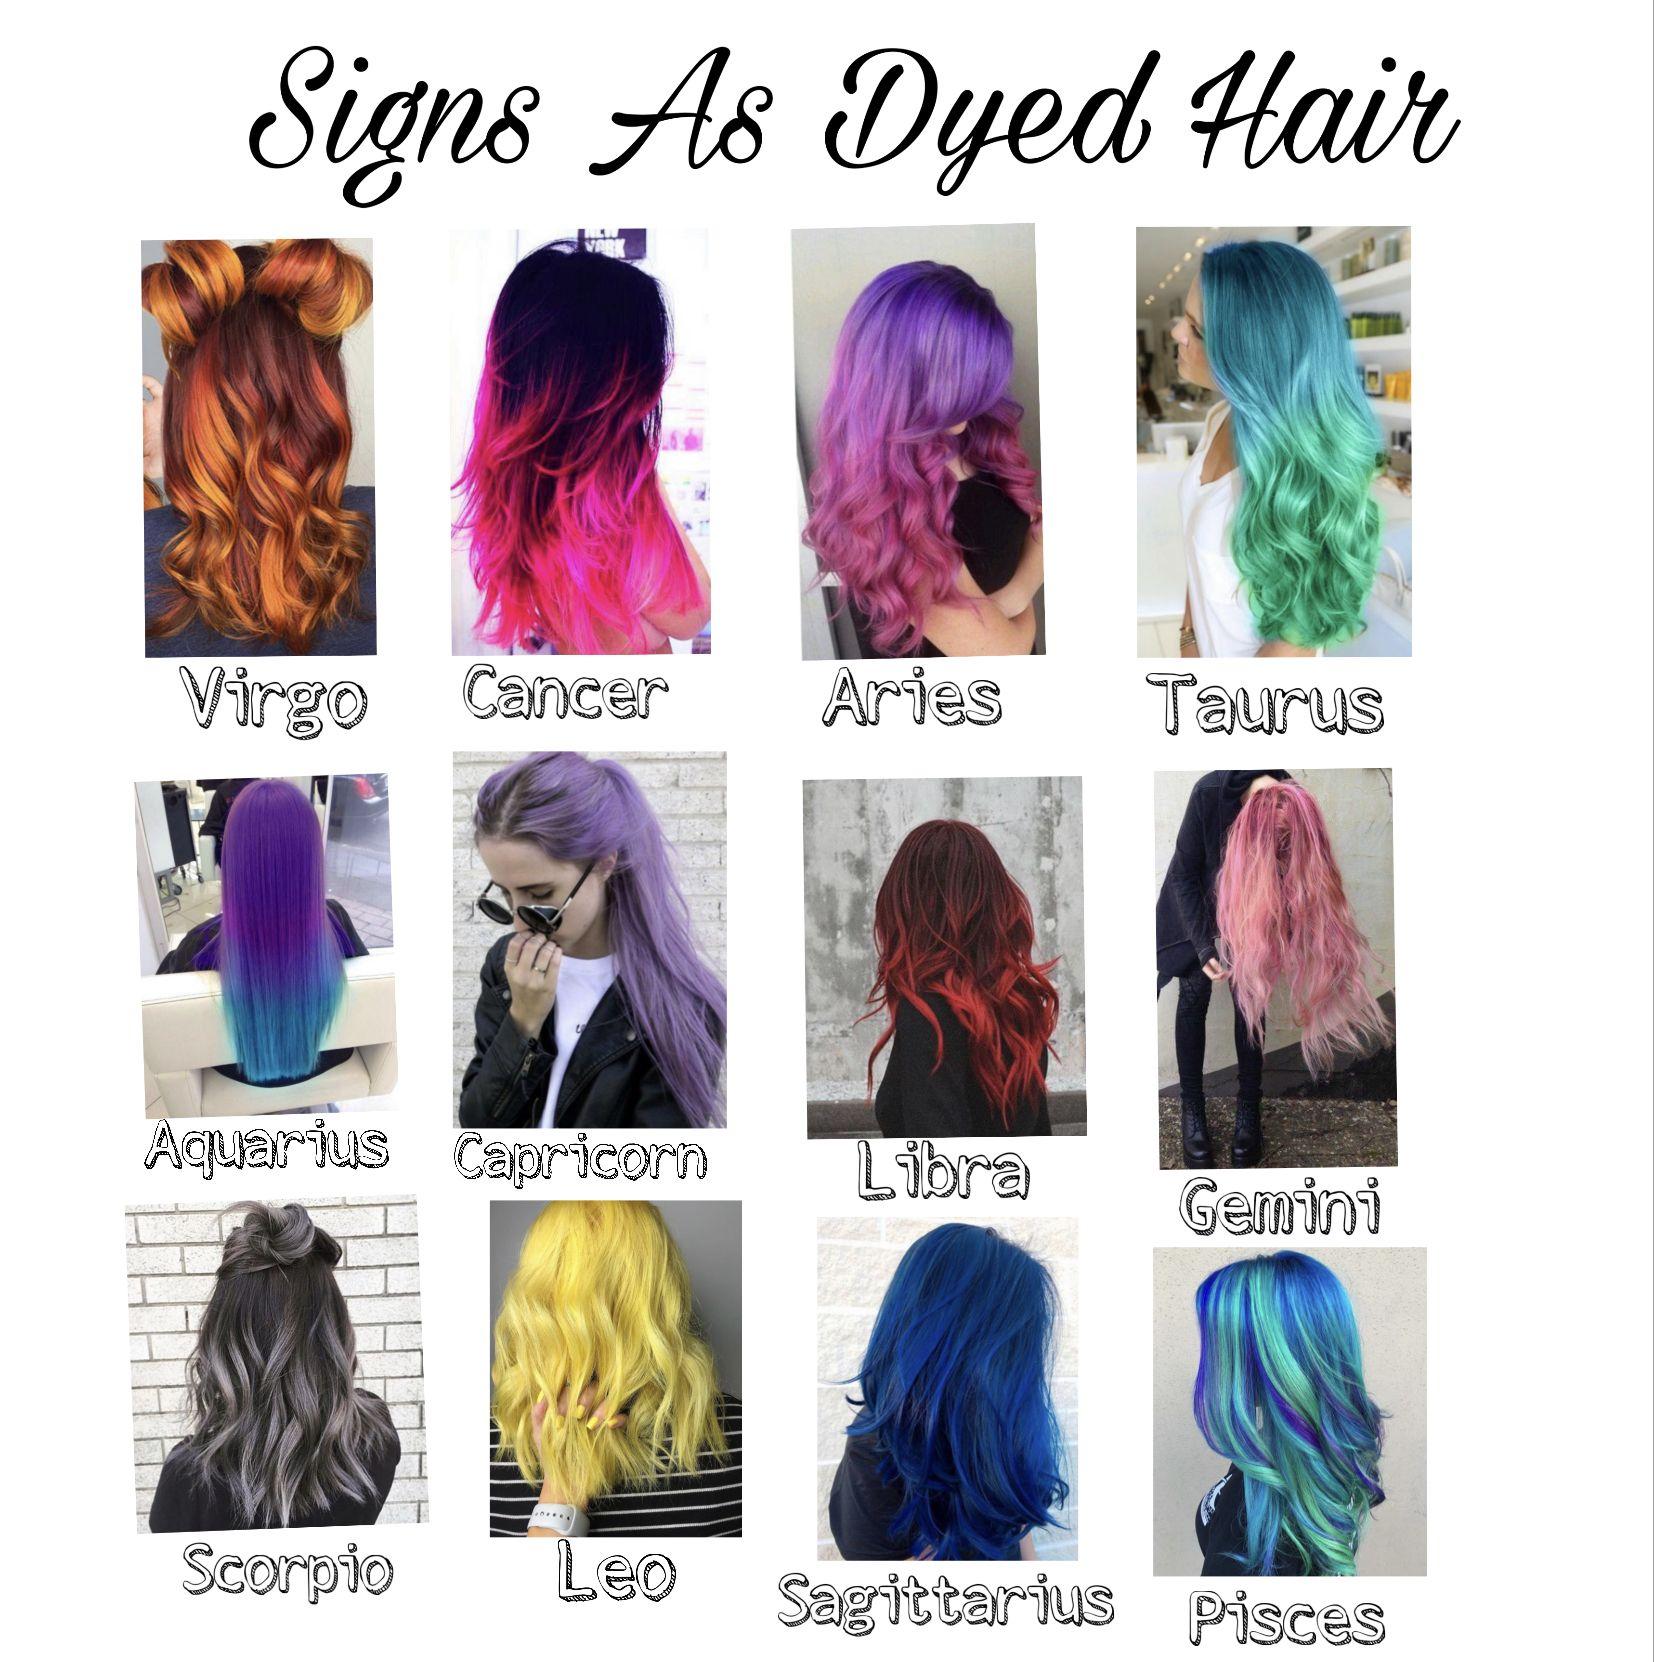 Pin By Julianna Tirado On Peinados Hairstyles Zodiac Signs Zodiac Sign Fashion Zodiac Signs Aquarius